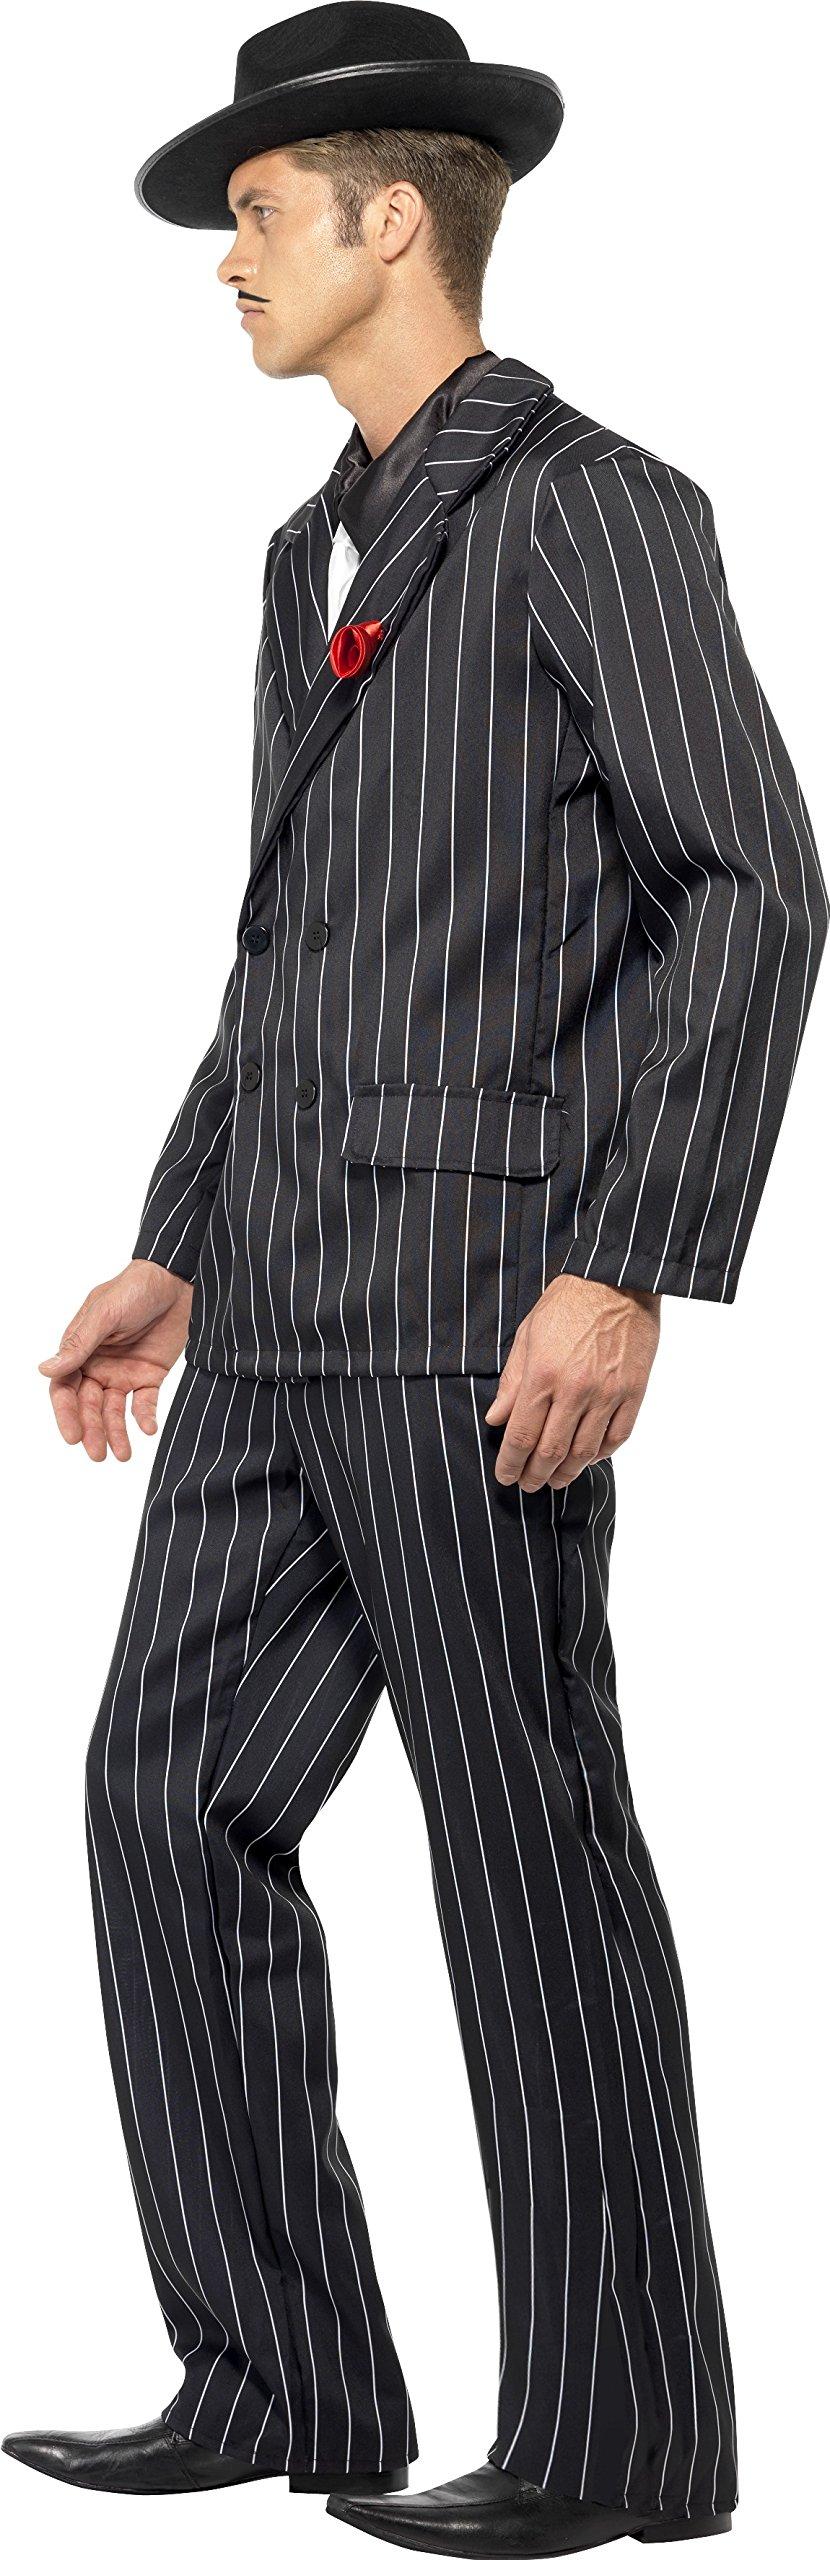 SmiffyS 25603L Traje De Hombre Con Chaqueta, Pantalones, Pechera De Camisa Y Corbata, Negro, L - Tamaño 42